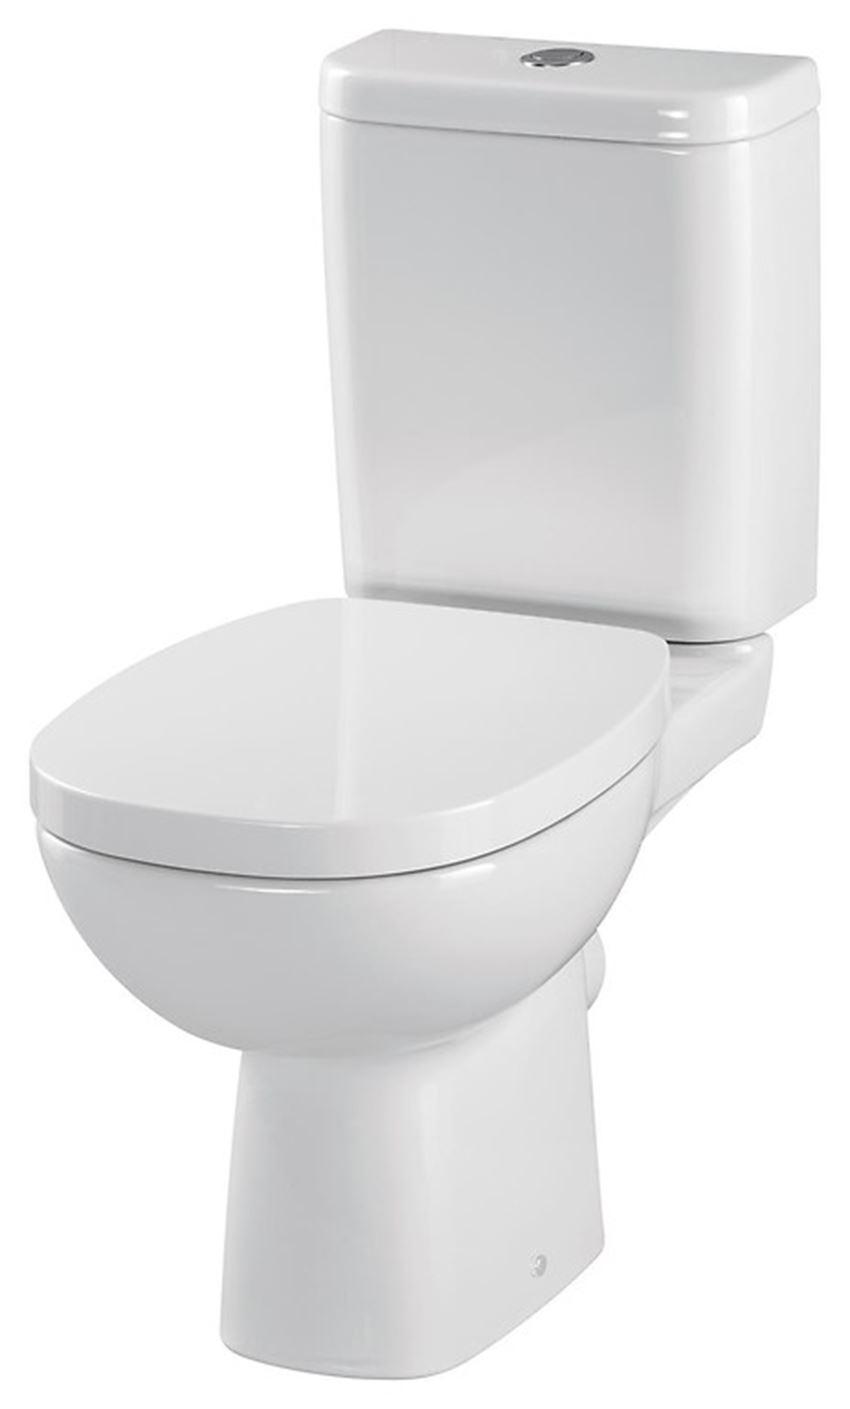 WC kompakt z deską duroplastową Cersanit Facile